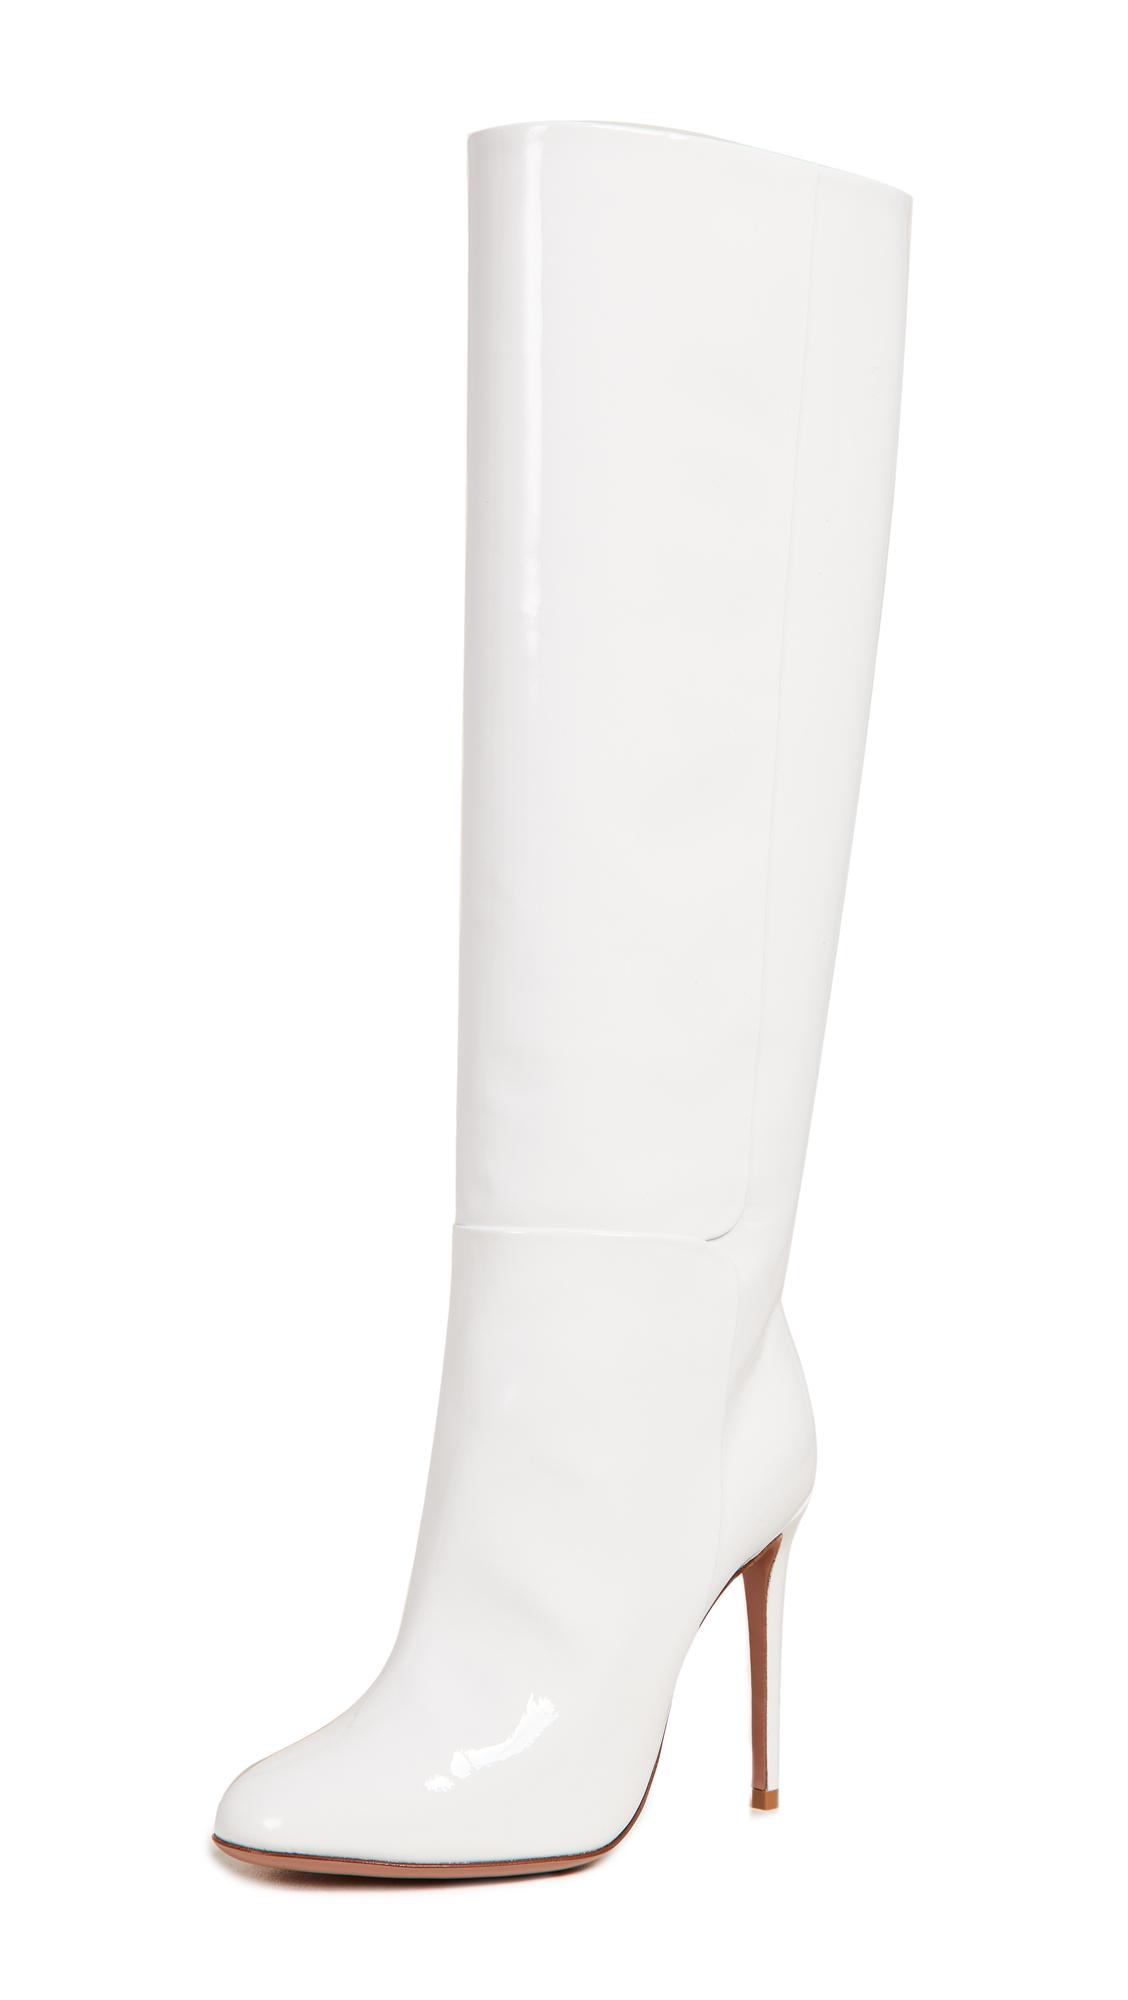 Aquazzura Brera 105 Boots - White